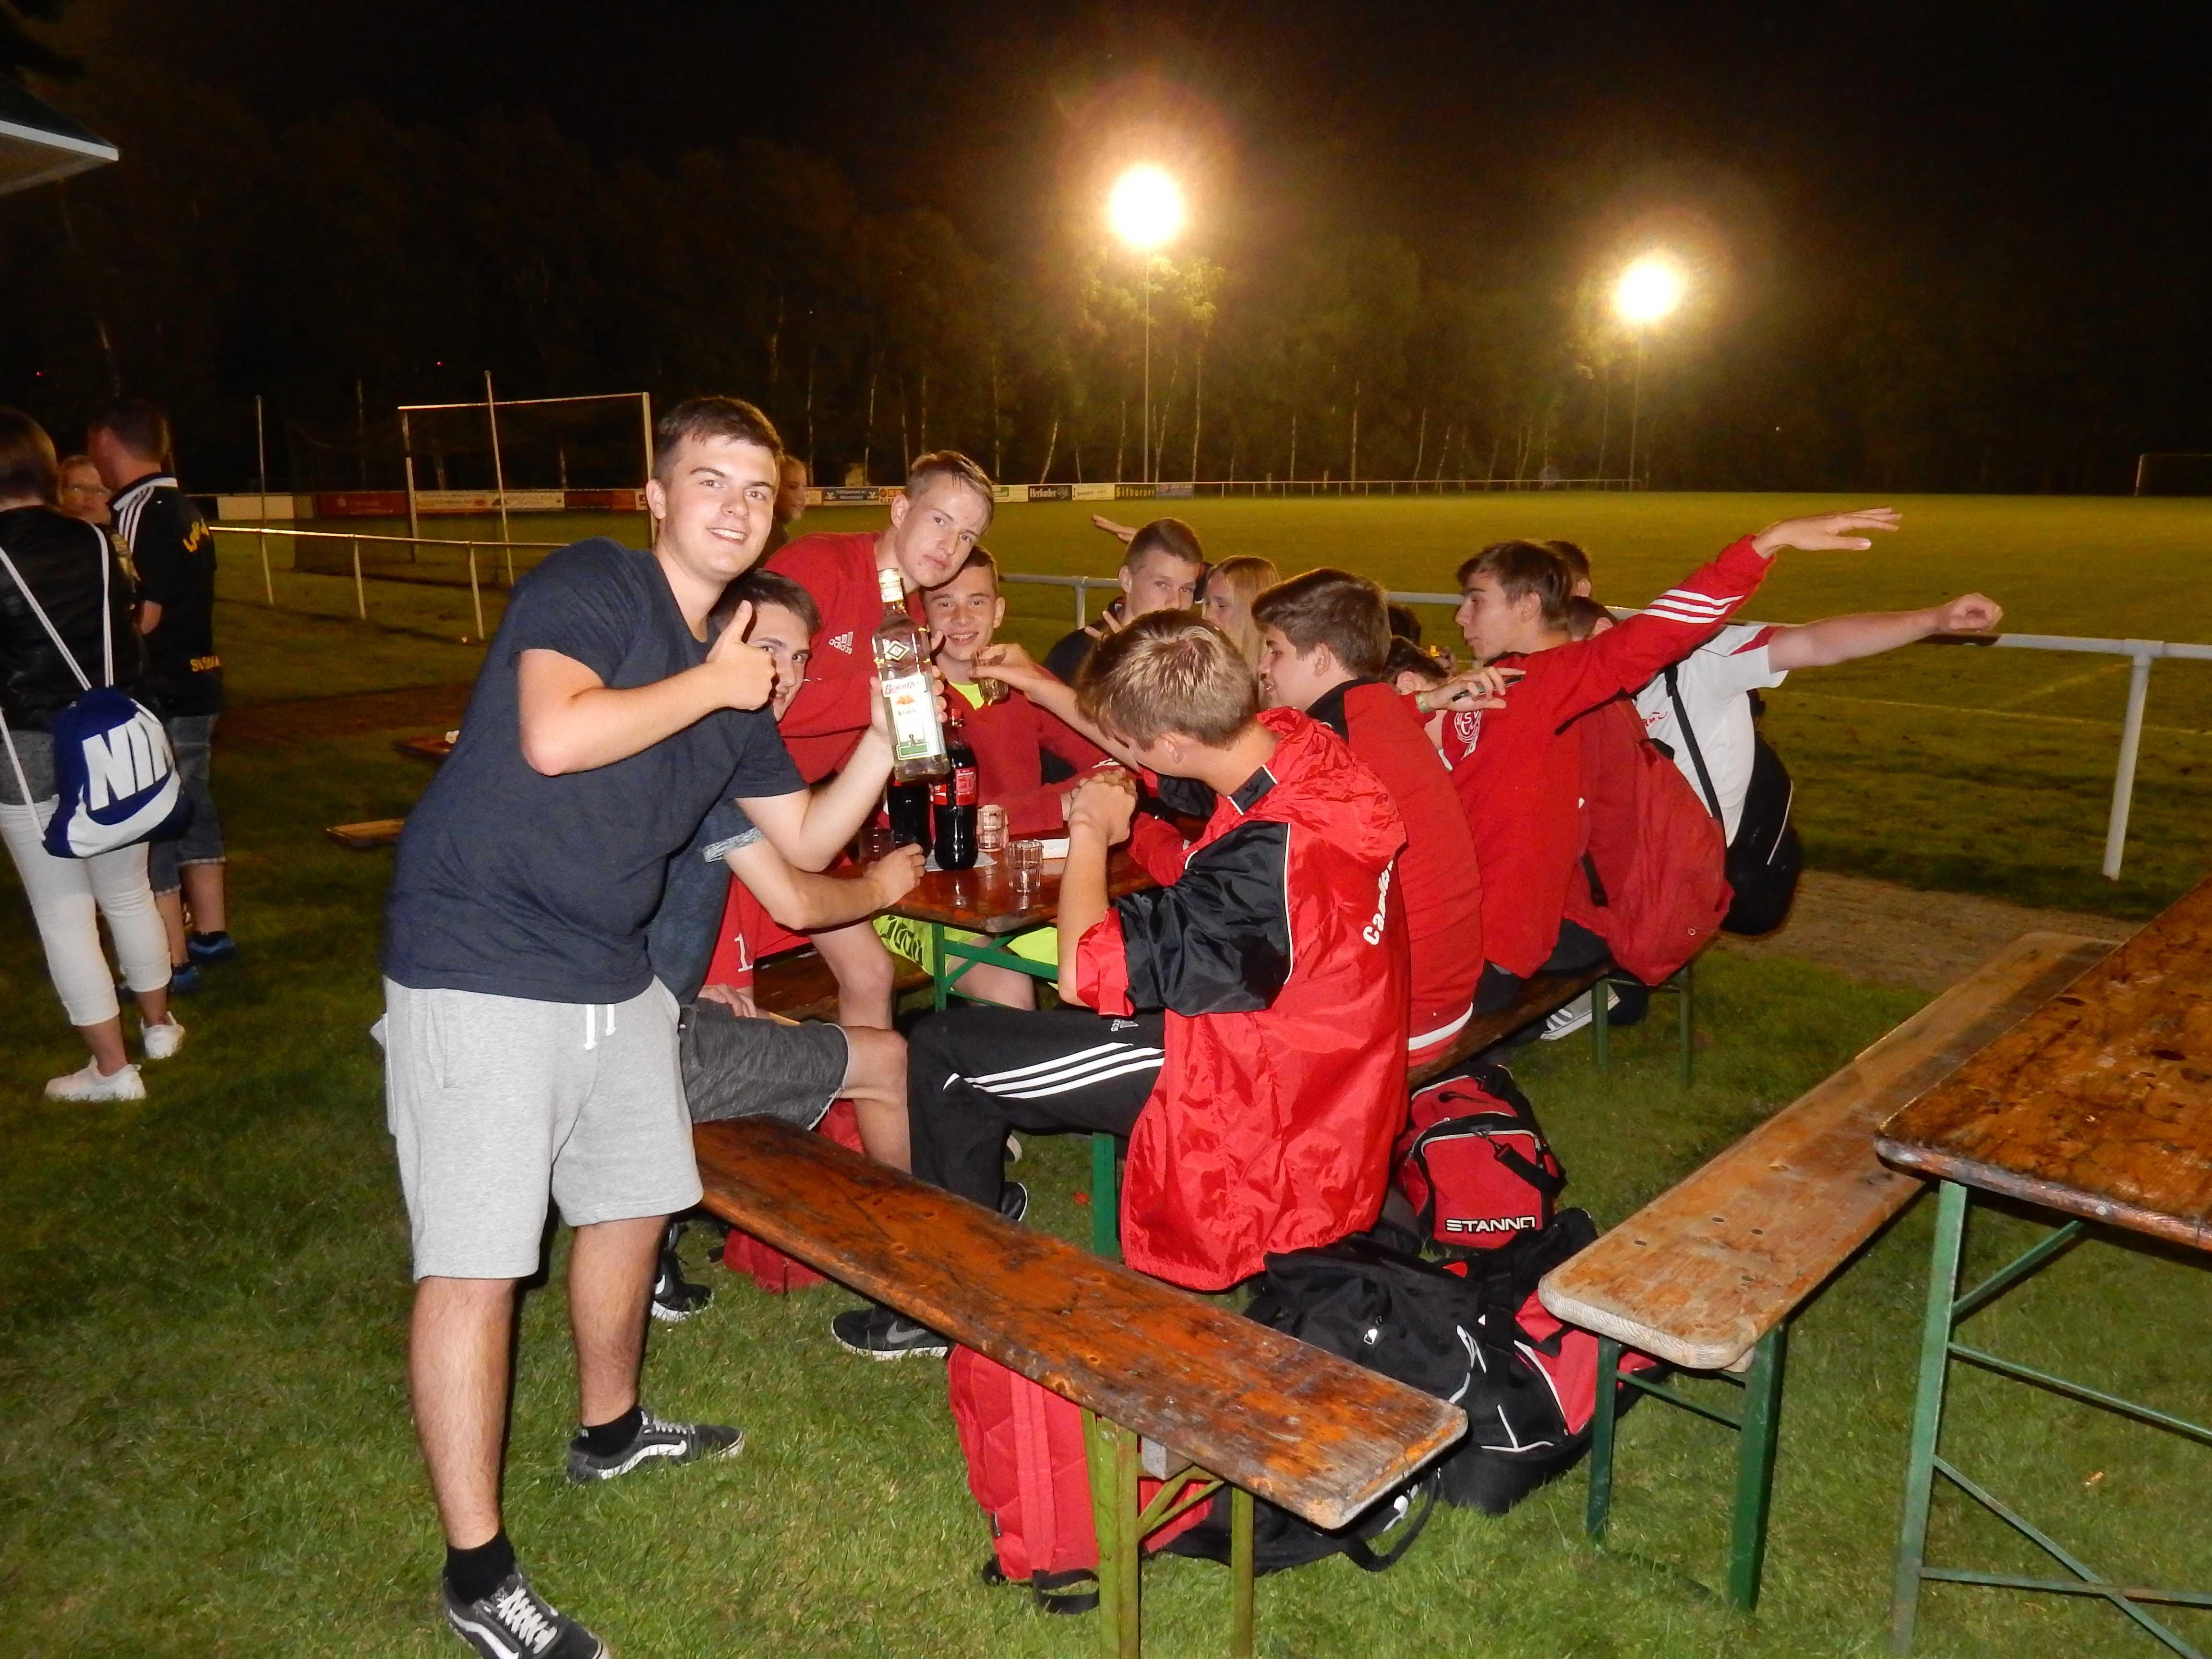 2016-07-28 Sportwoche - erster Donnerstag (66)